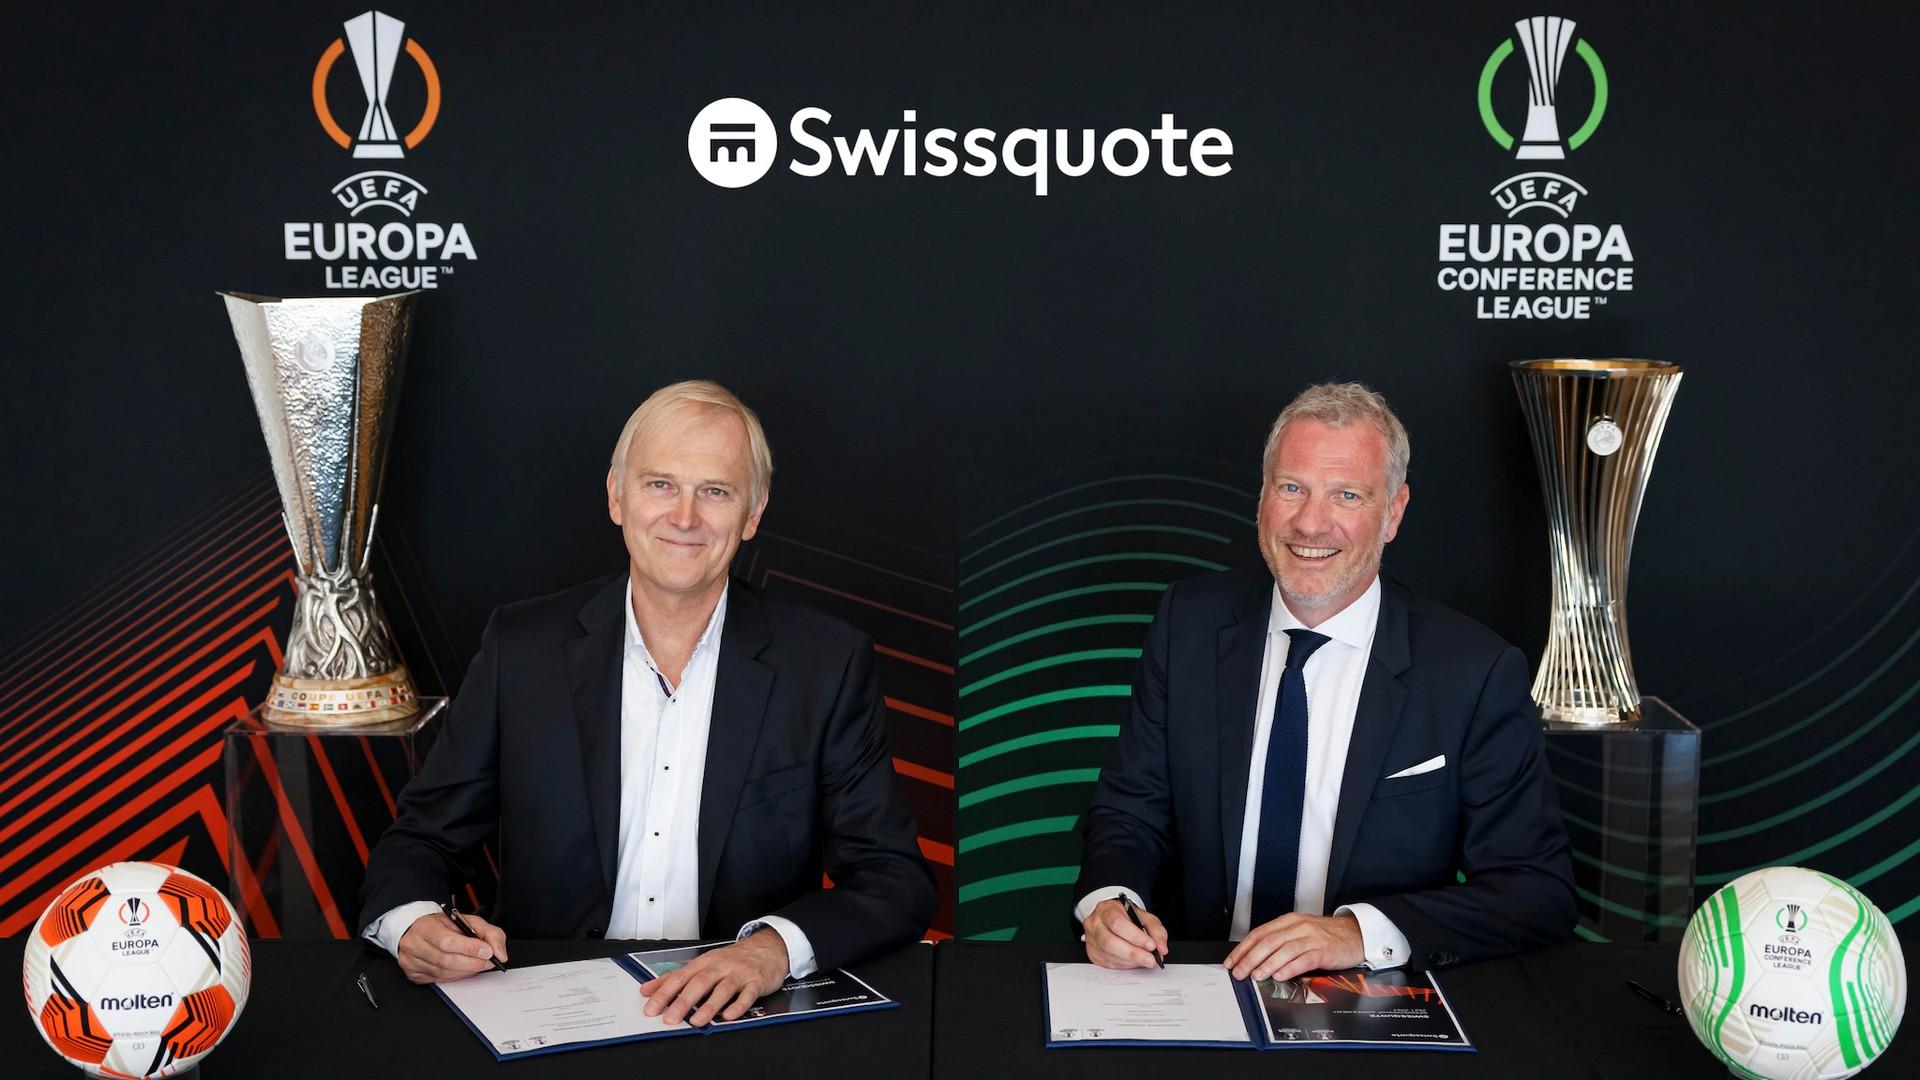 Swissquopte x UEFA Ligue Europa (football) 2021